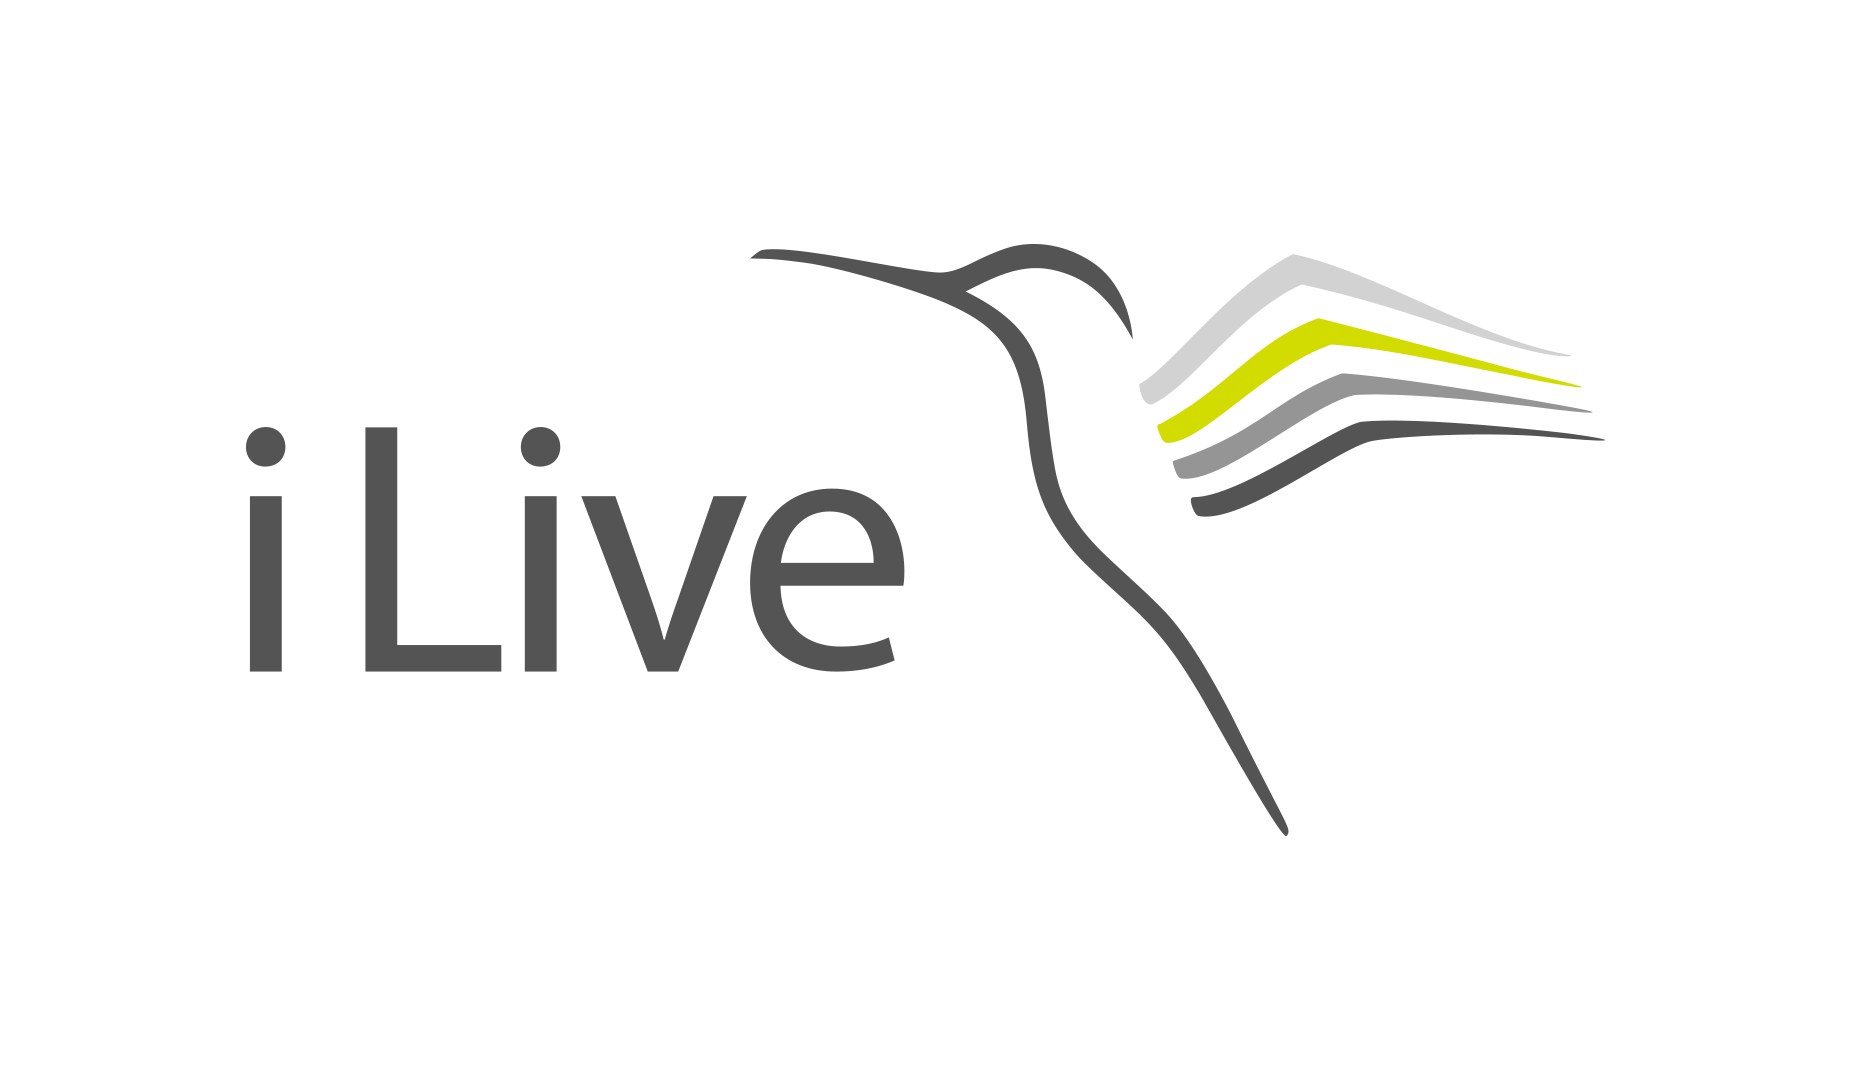 i_live-LOGO